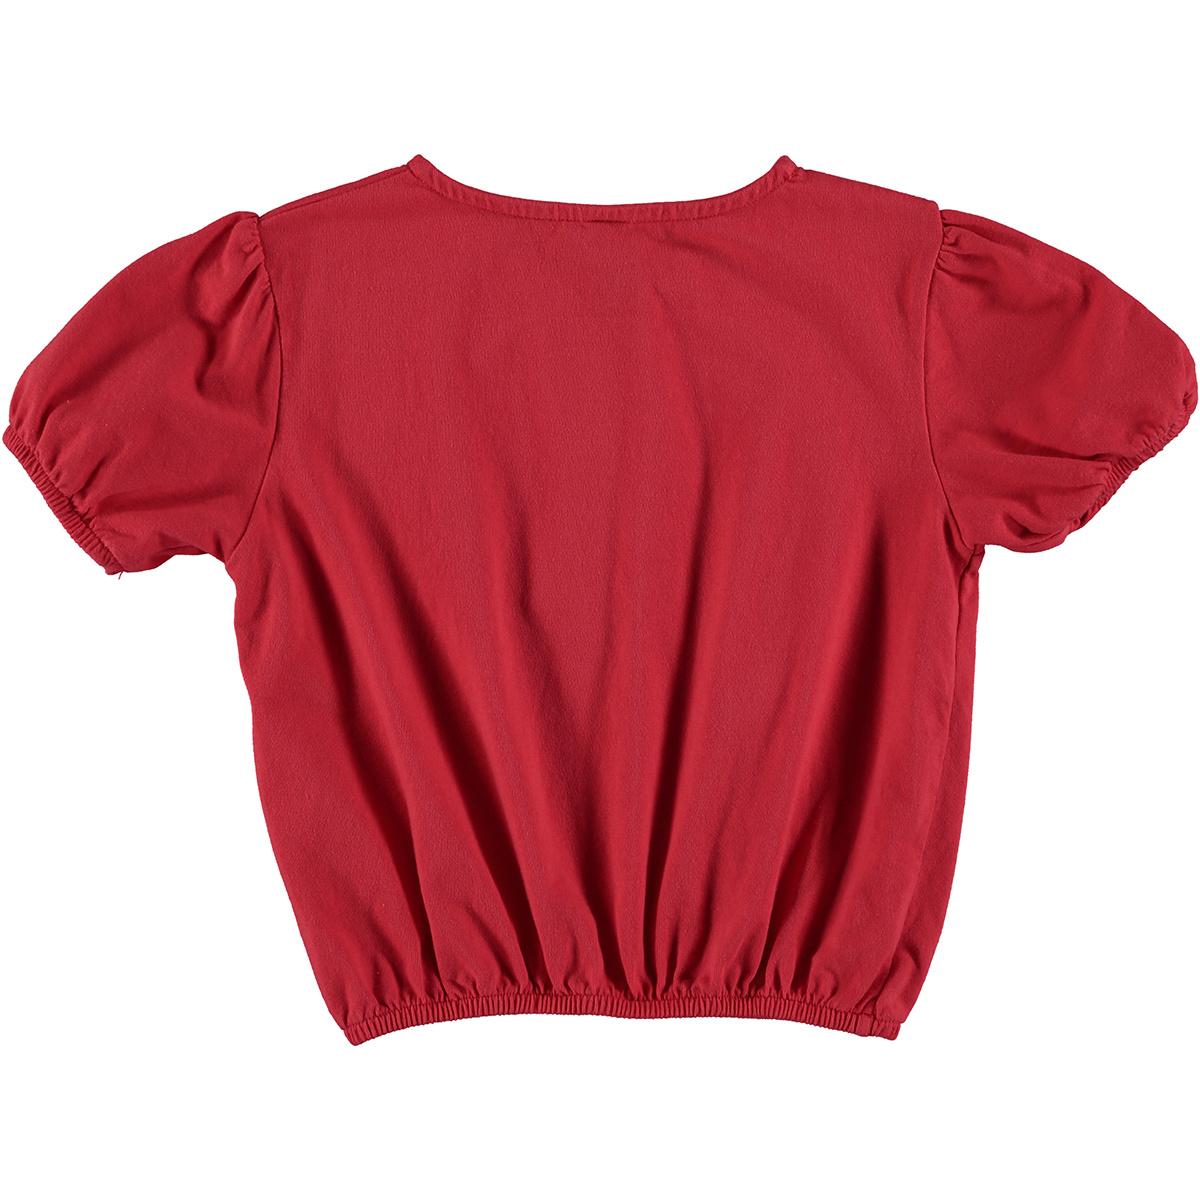 Crop T-shirt kid Bonmot - Red-2